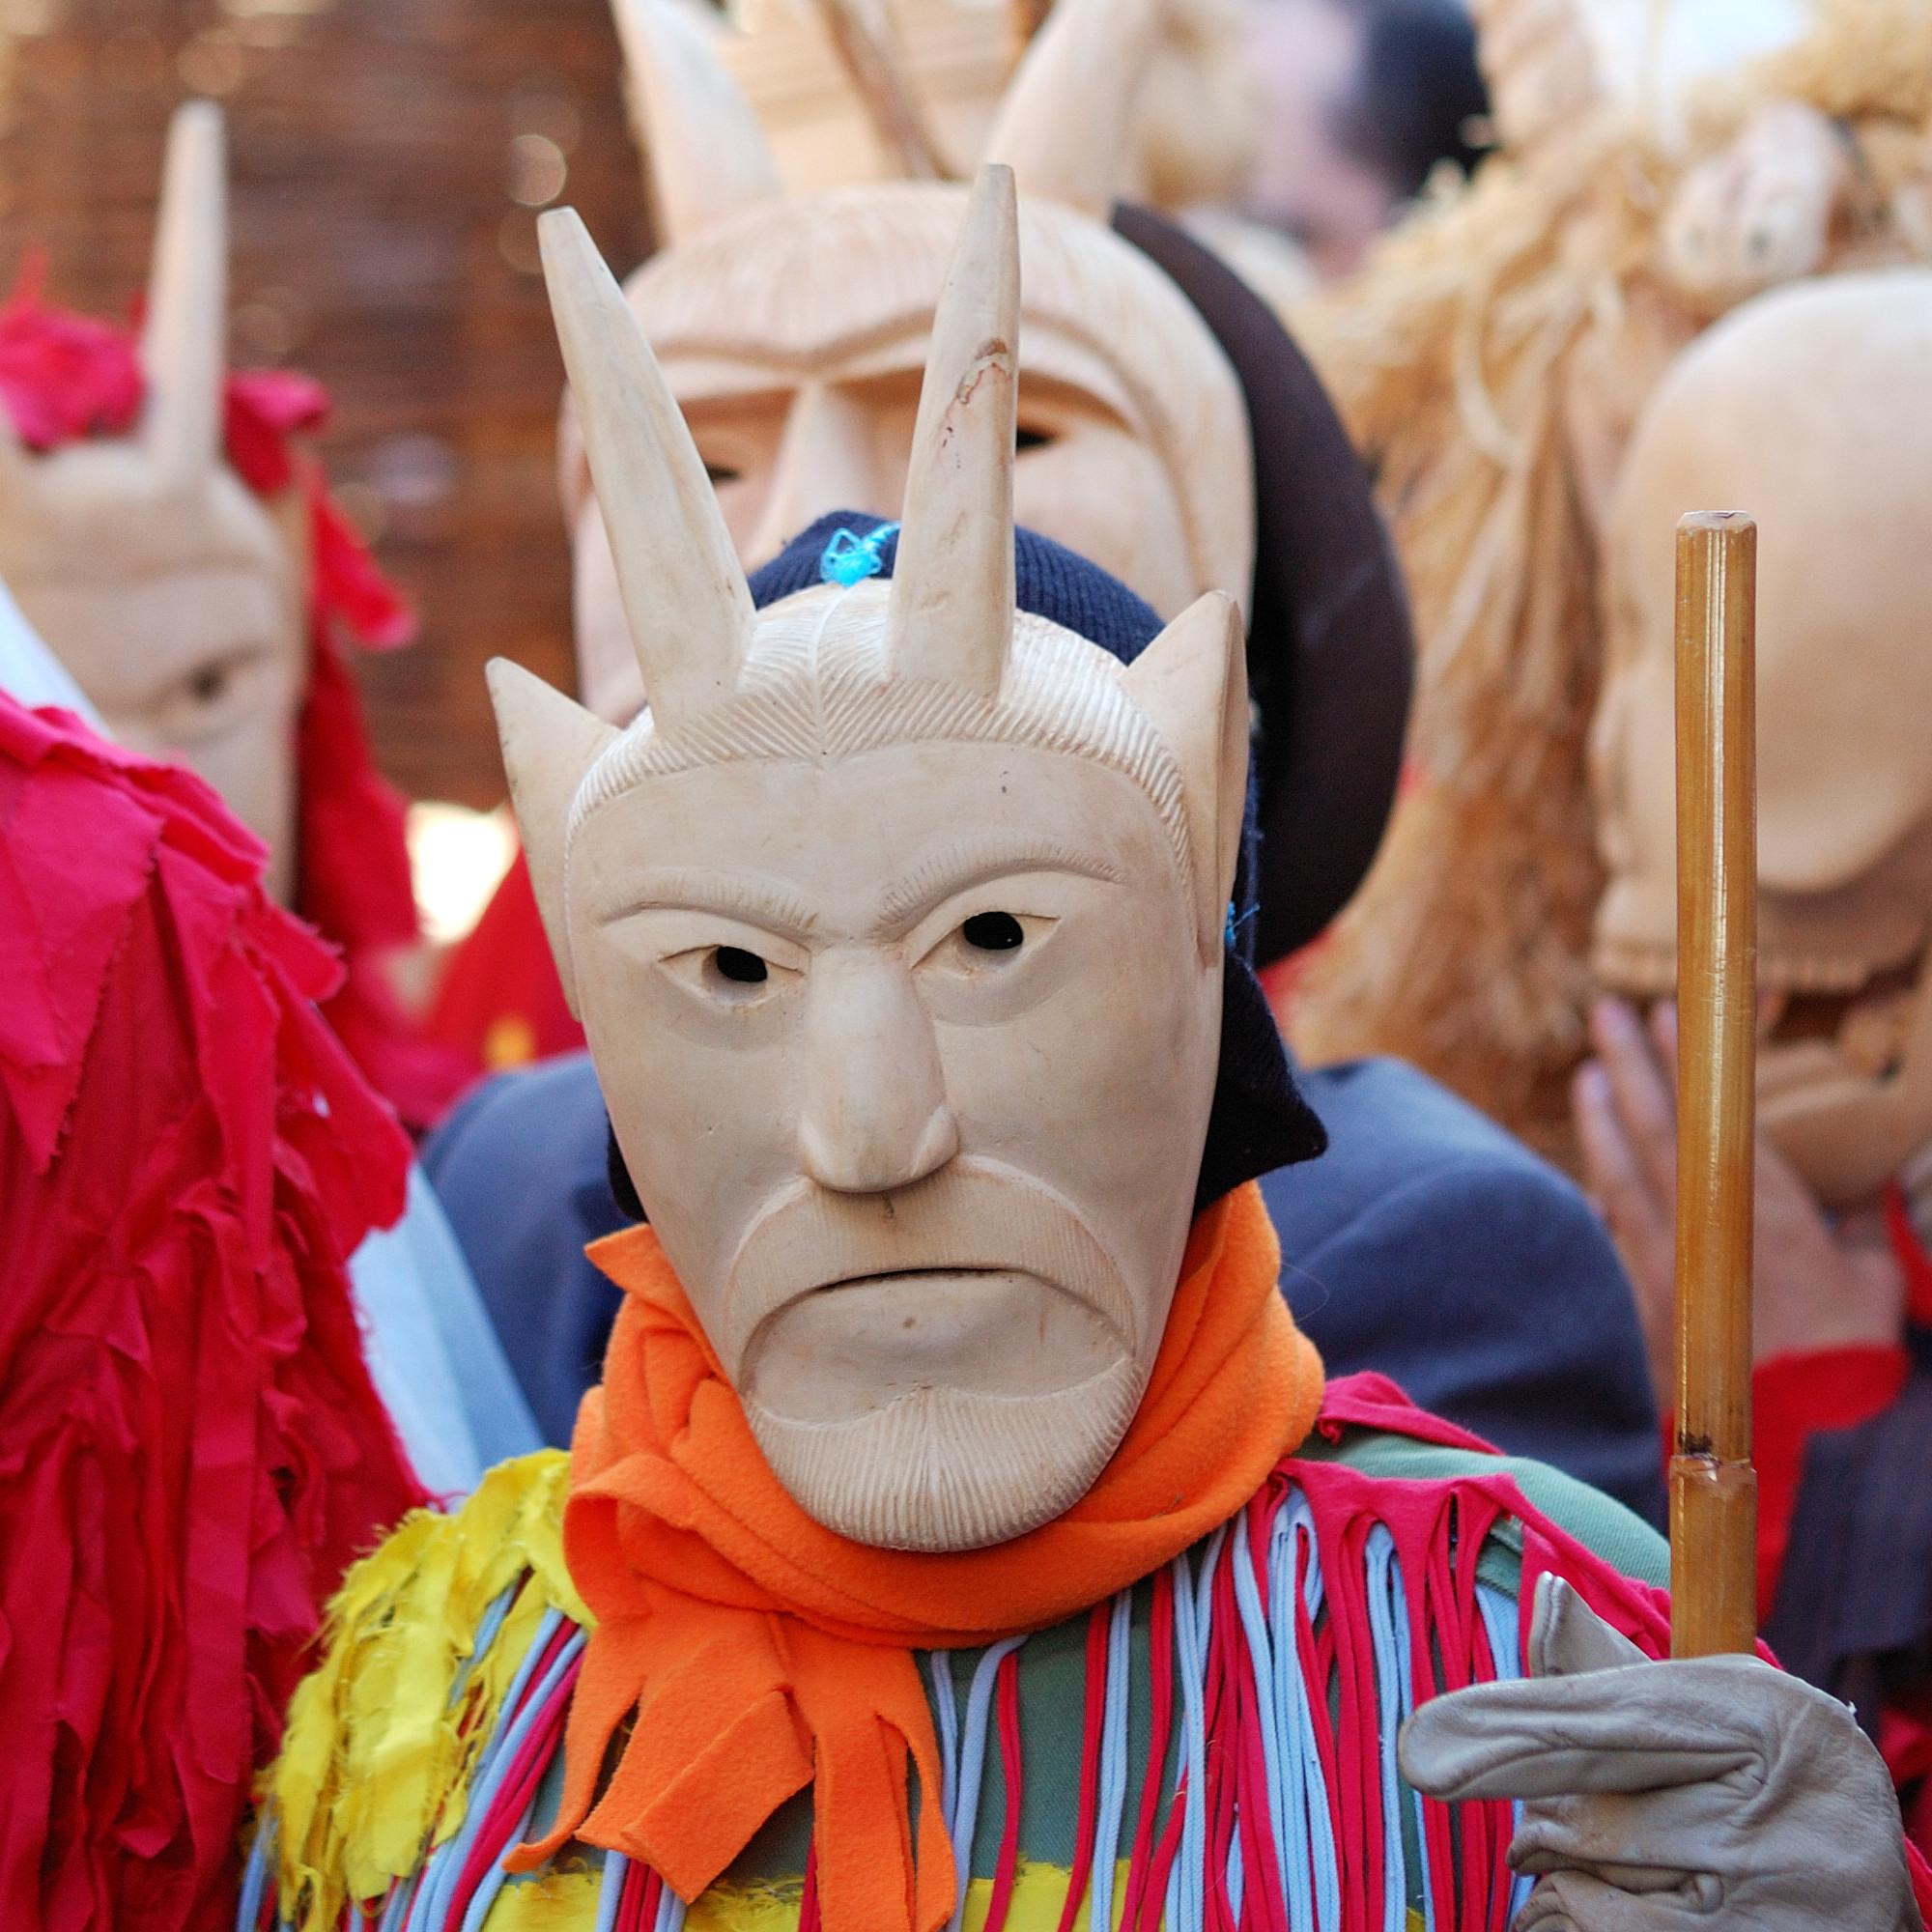 Carnaval de Lazarim 02.jpg